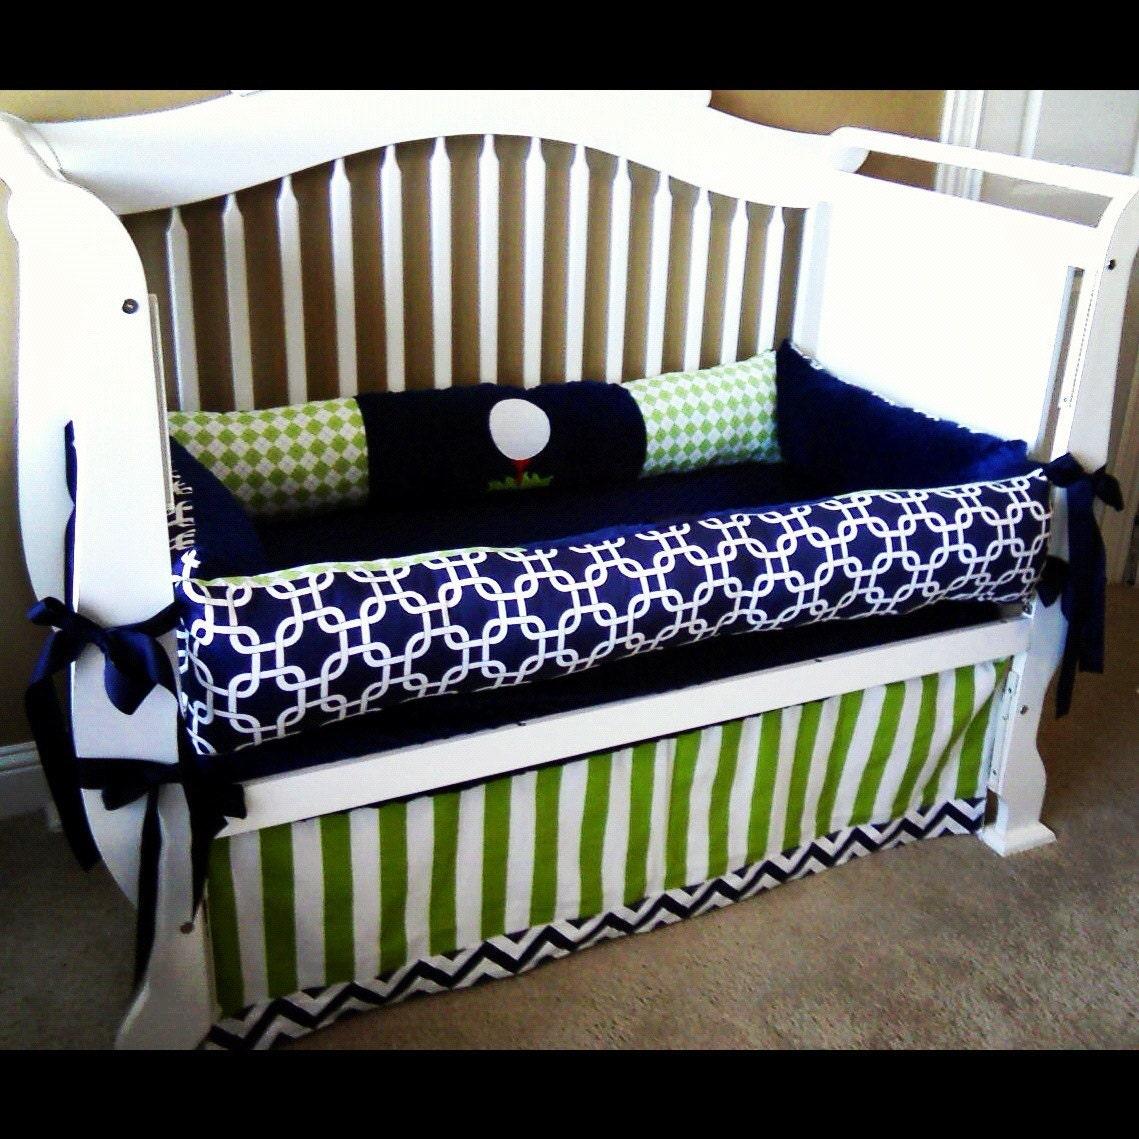 thane custom baby bedding crib set 3 pc set. Black Bedroom Furniture Sets. Home Design Ideas